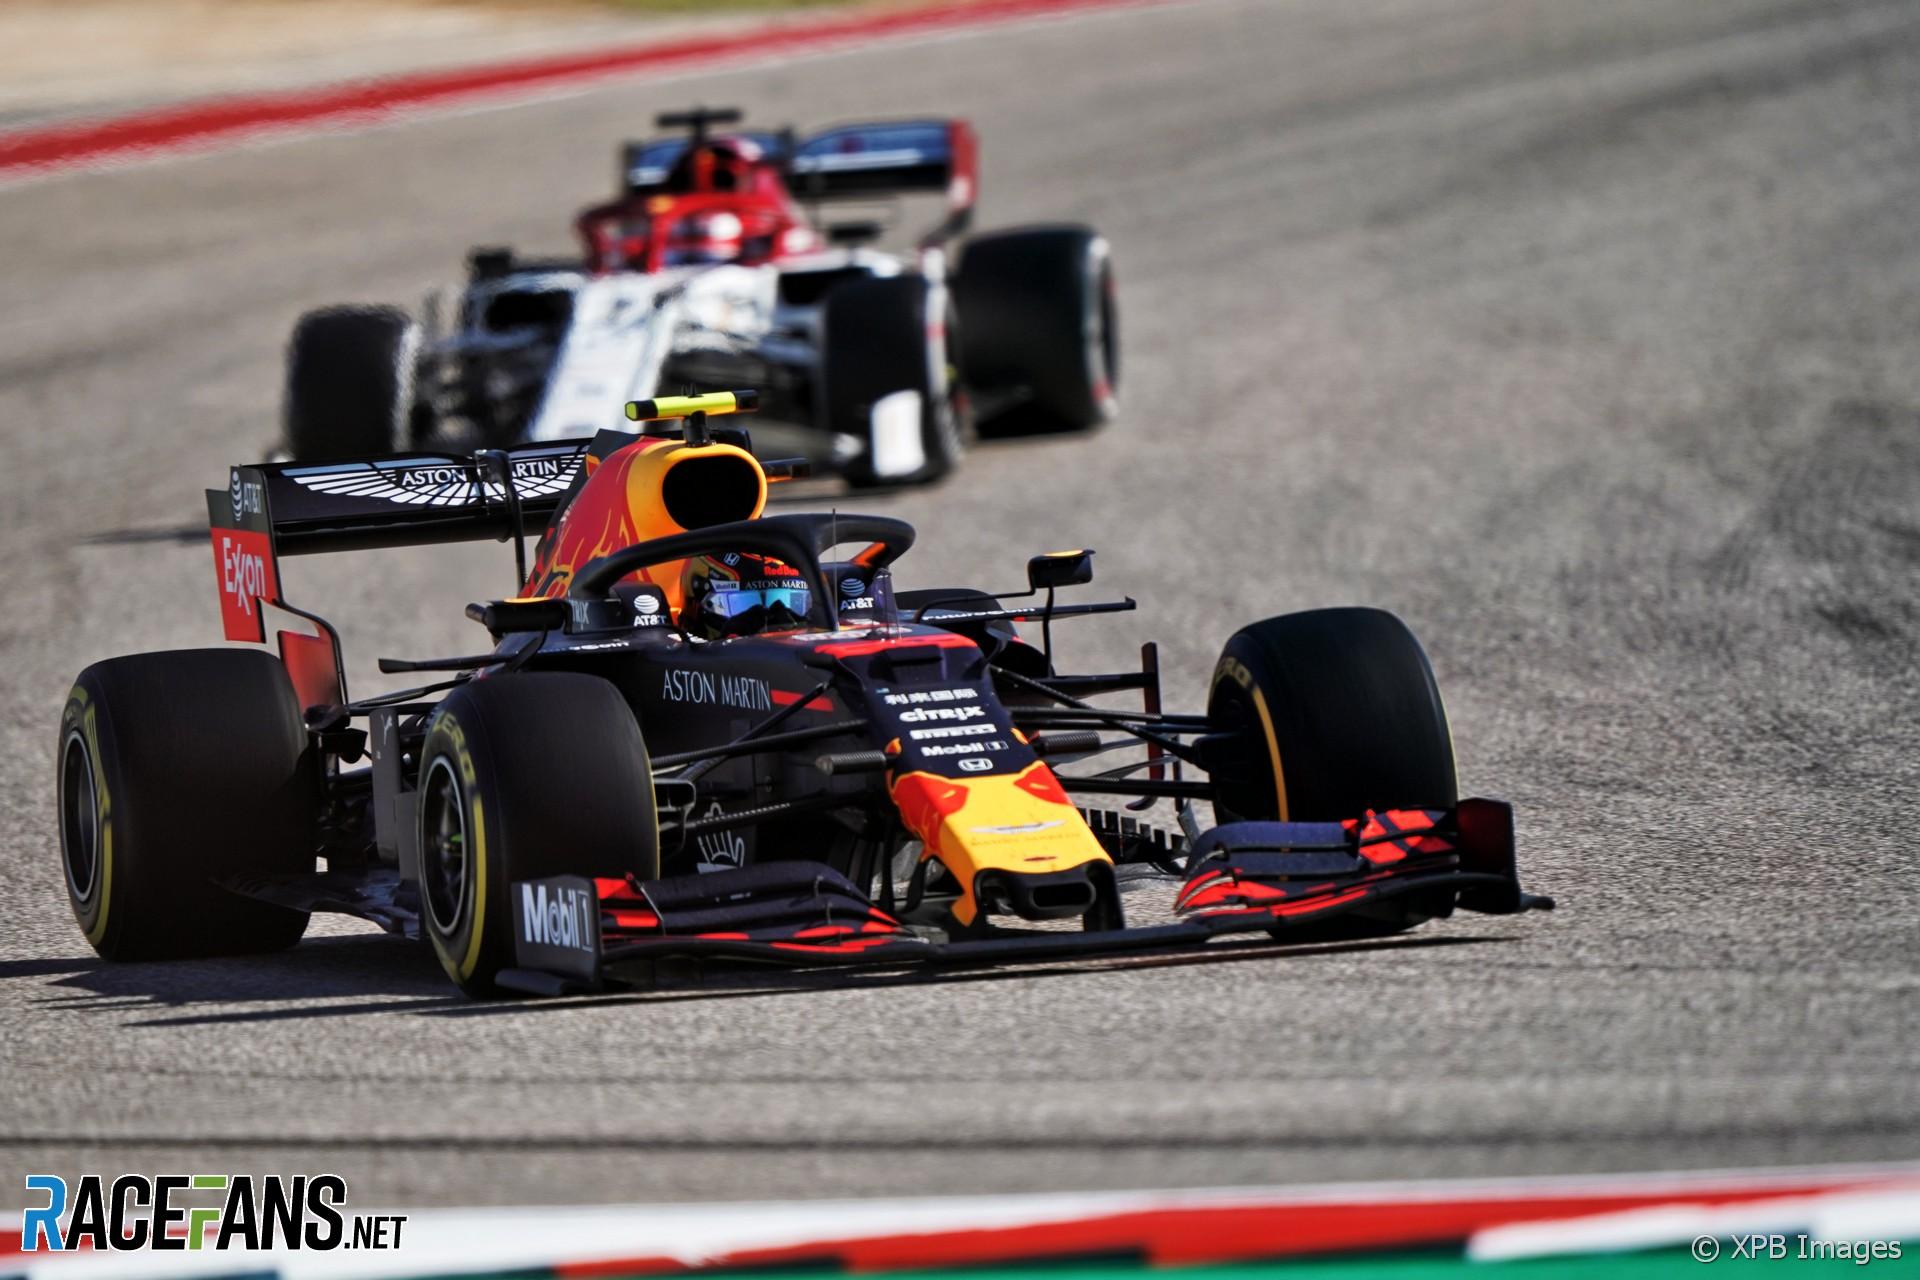 Alexander Albon, Red Bull, Circuit of the Americas, 2019